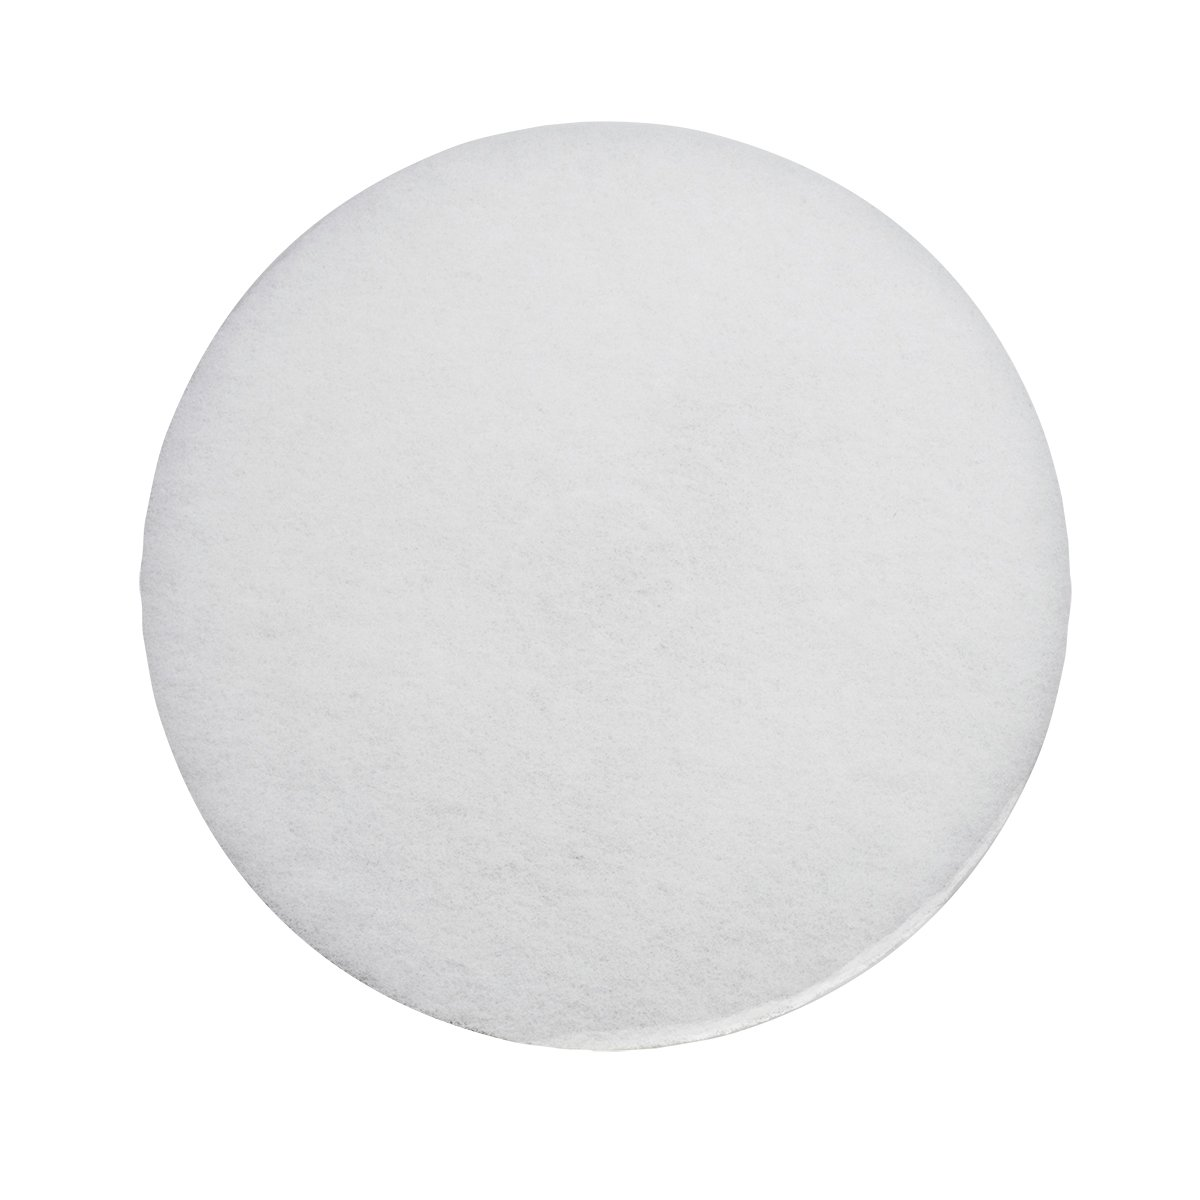 UltraSource Floor Polishing Pad, 17'', White (Pack of 5)